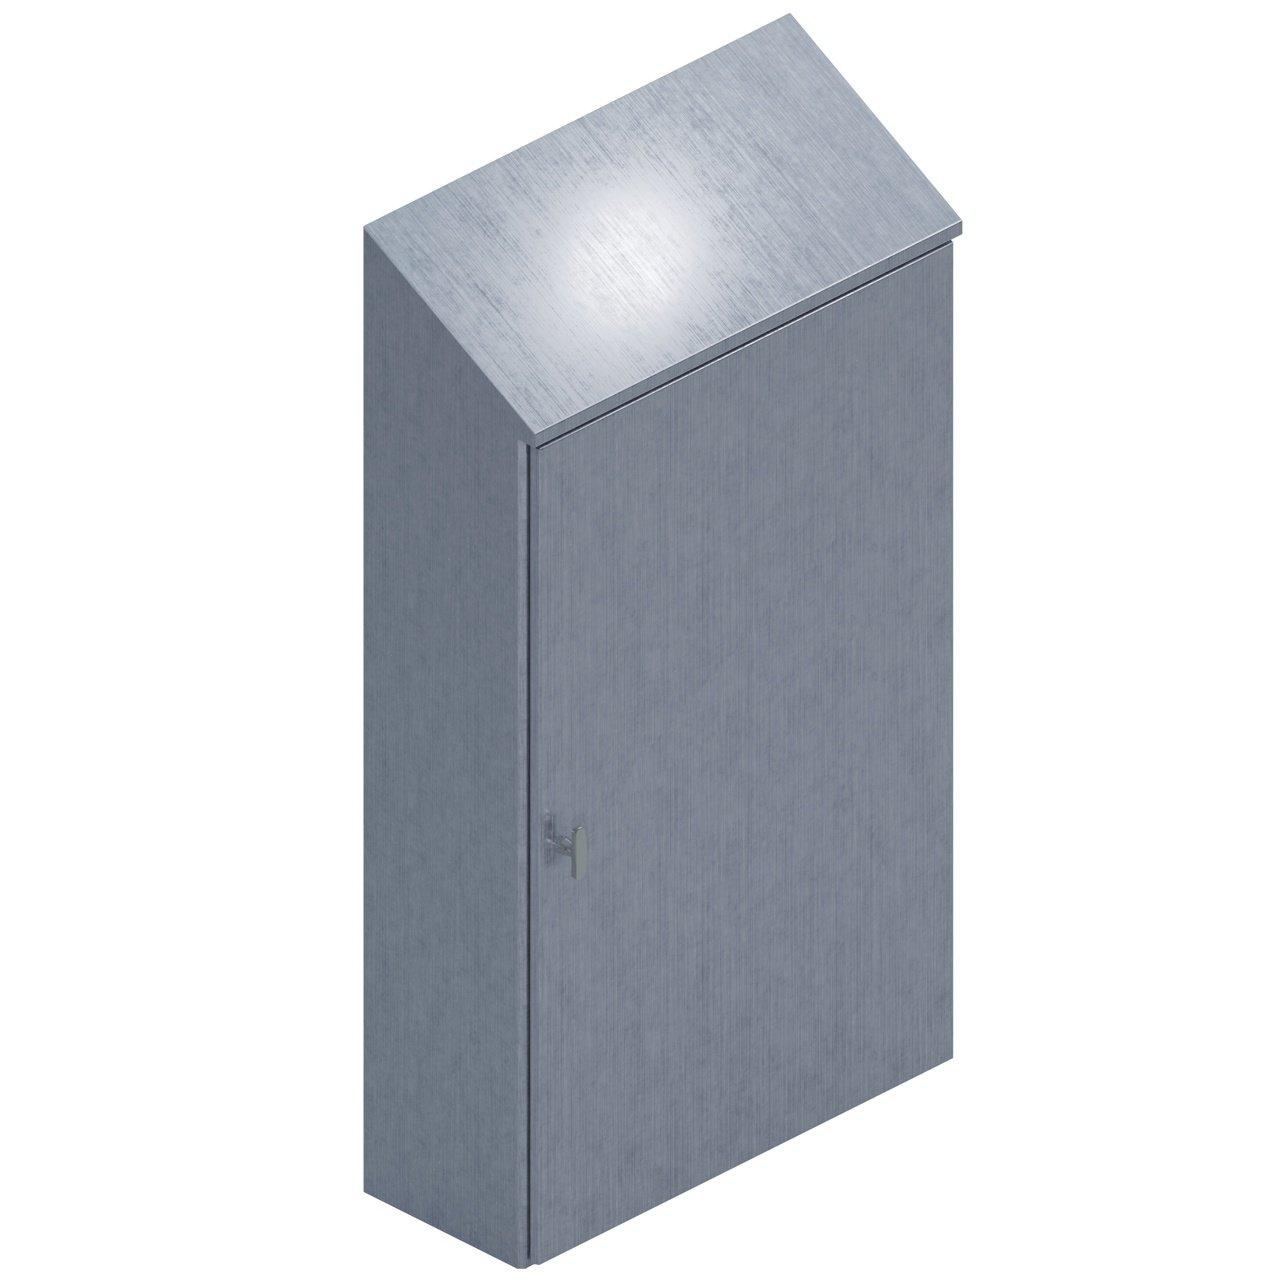 OMEGA eintürig | 2000x600x1000 mm